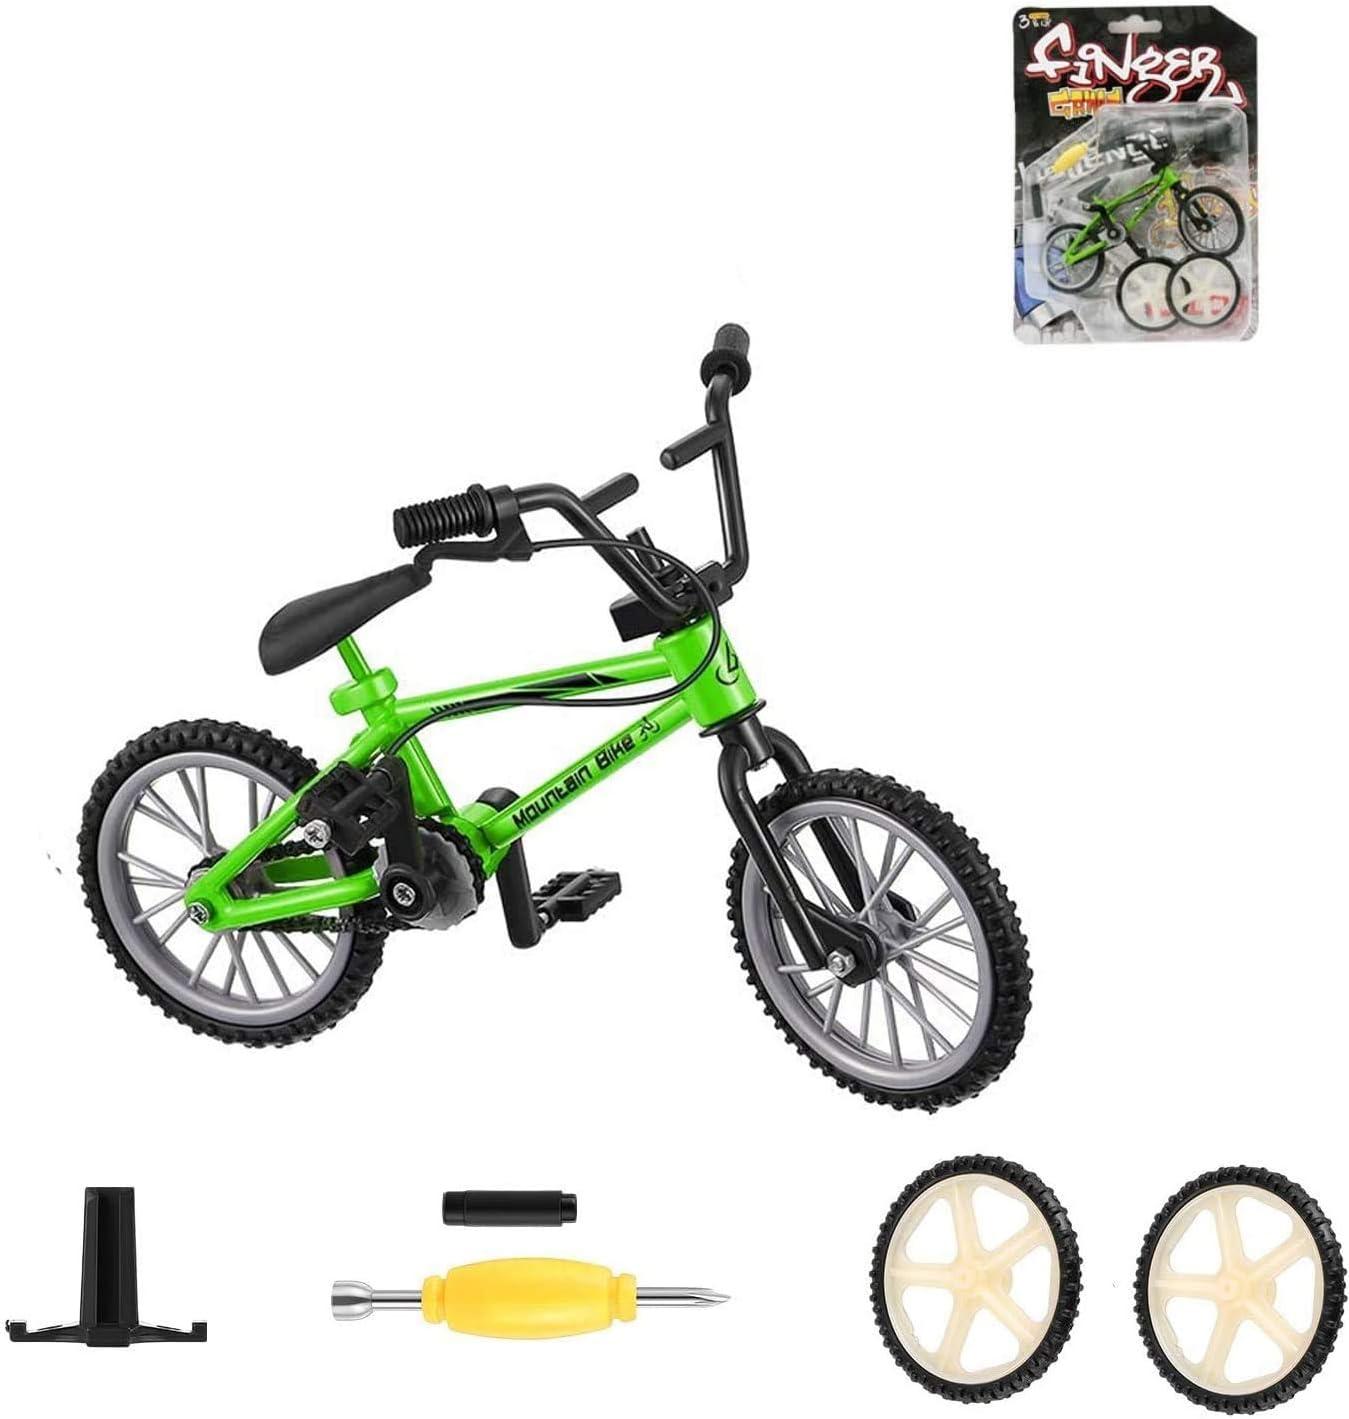 Zeyujie Our 1 year warranty shop most popular Green 1:12 Mini Toy Model Outdoor Bicy Scene Accessories